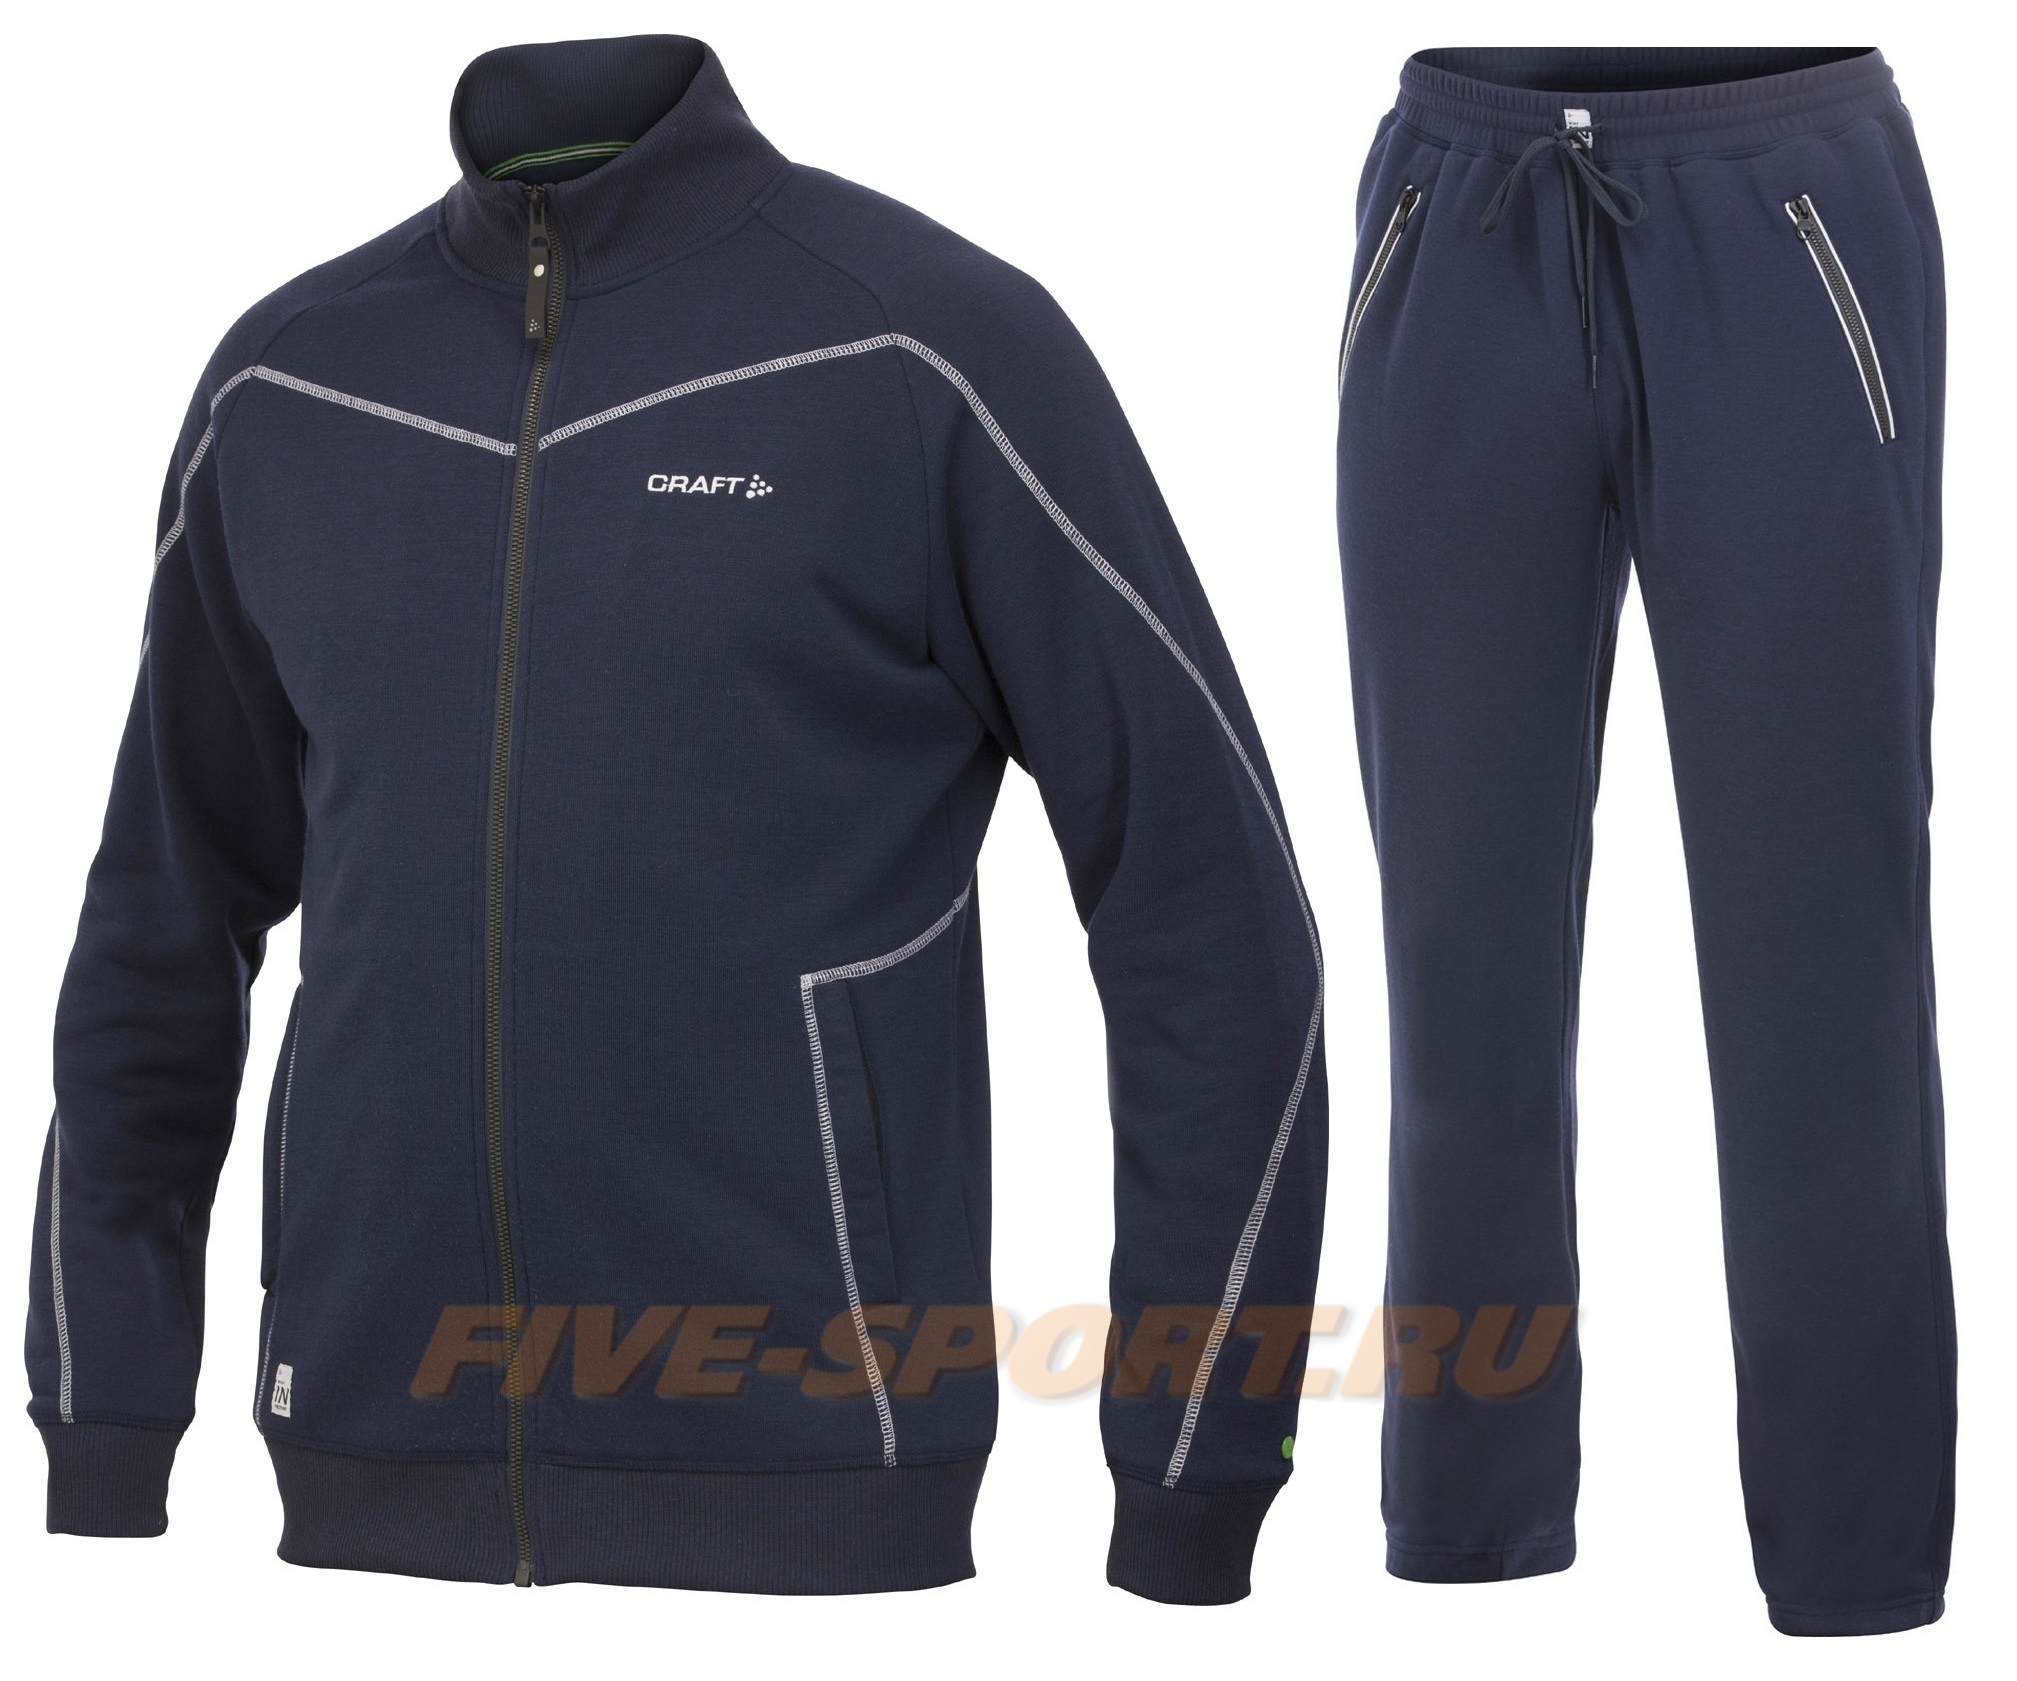 Мужской спортивный костюм для бега Craft In The Zone blue (1902636-2395-1902644-2395)